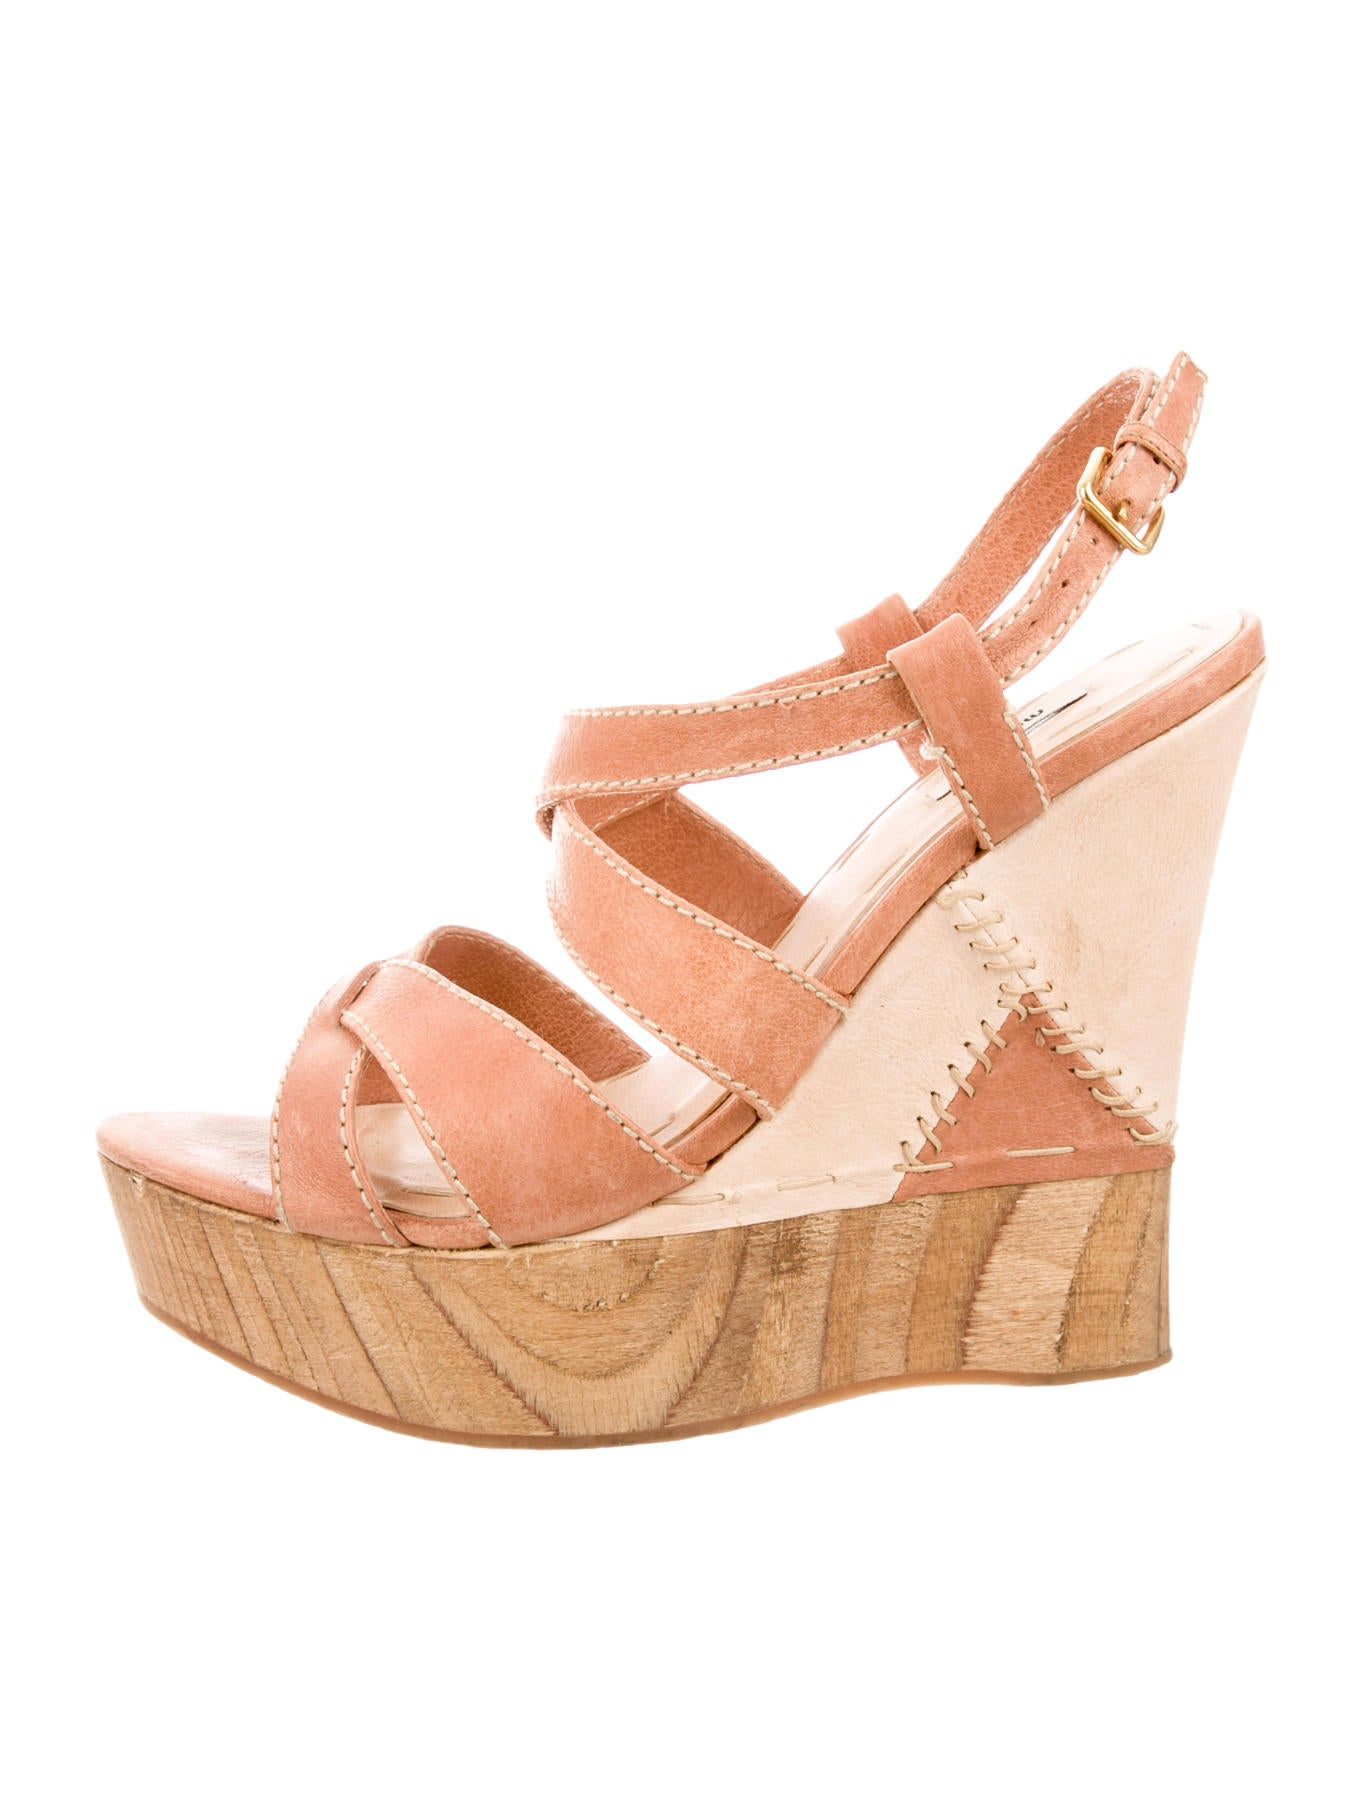 miu miu platform wedges shoes miu31892 the realreal